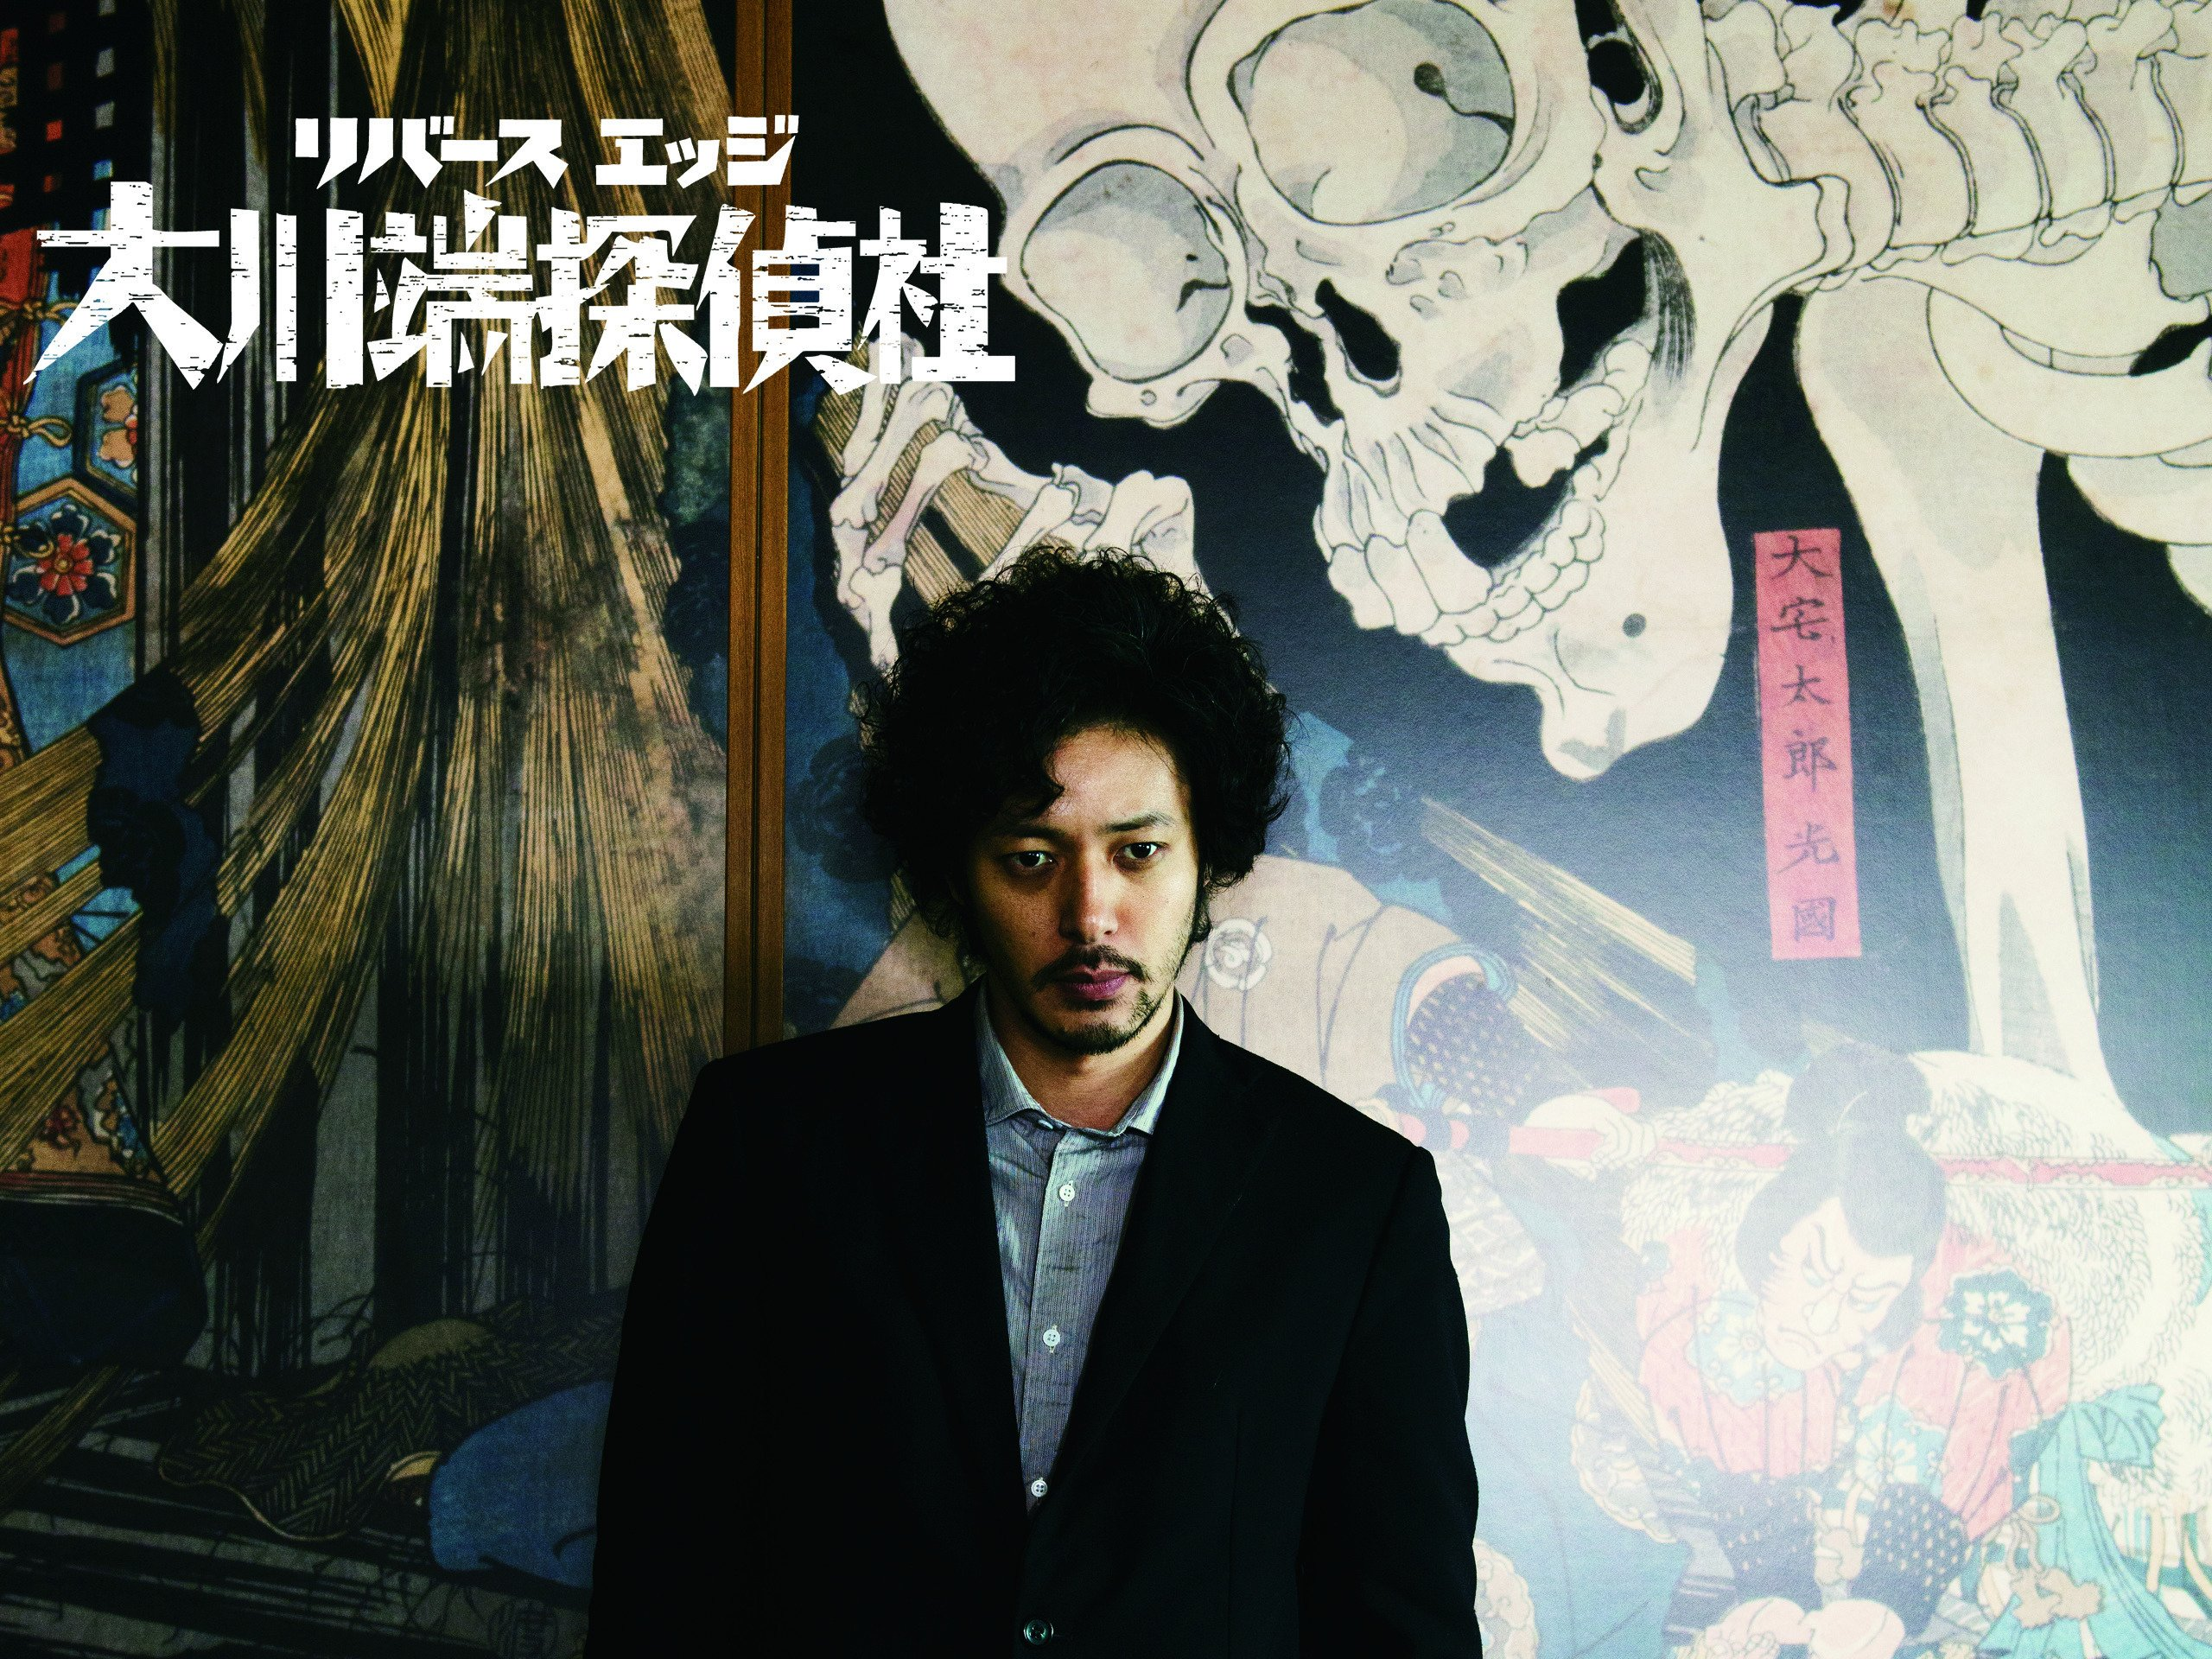 Amazon.co.jp: リバースエッジ 大川端探偵社を観る | Prime Video